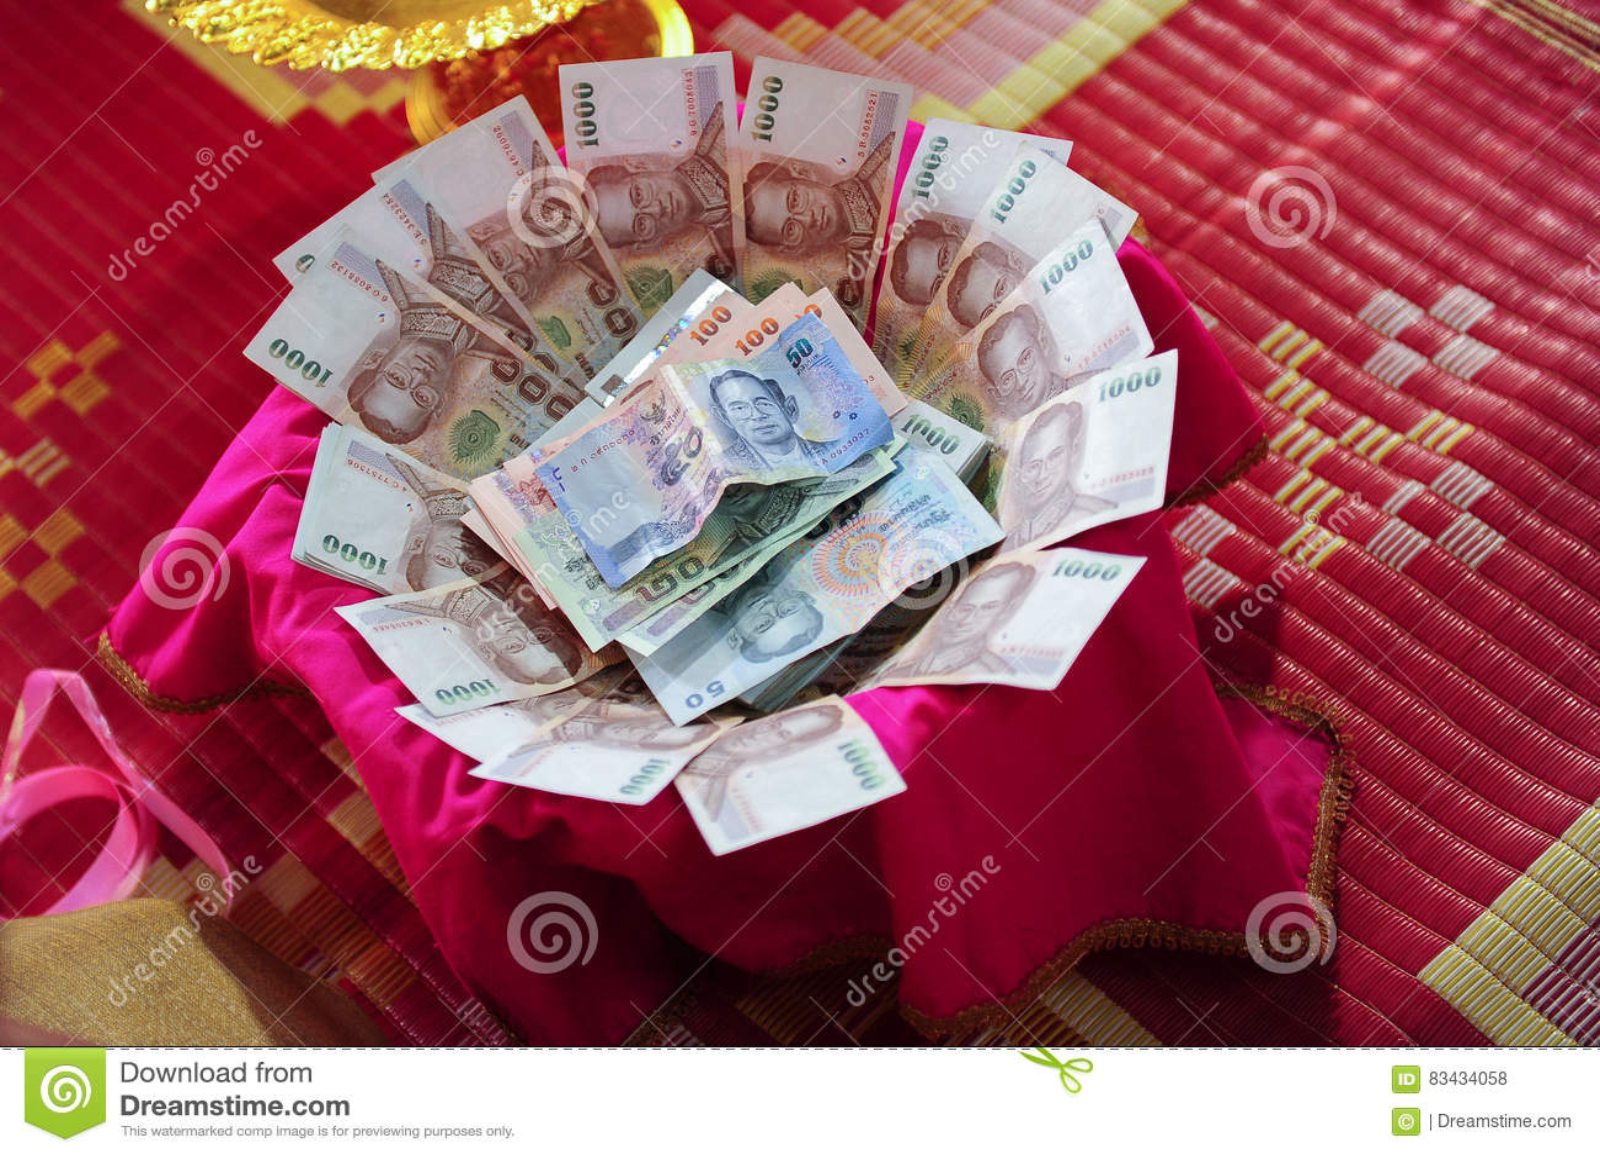 Money Or Thai Wedding Bride Price Stock Photo Image Of Background